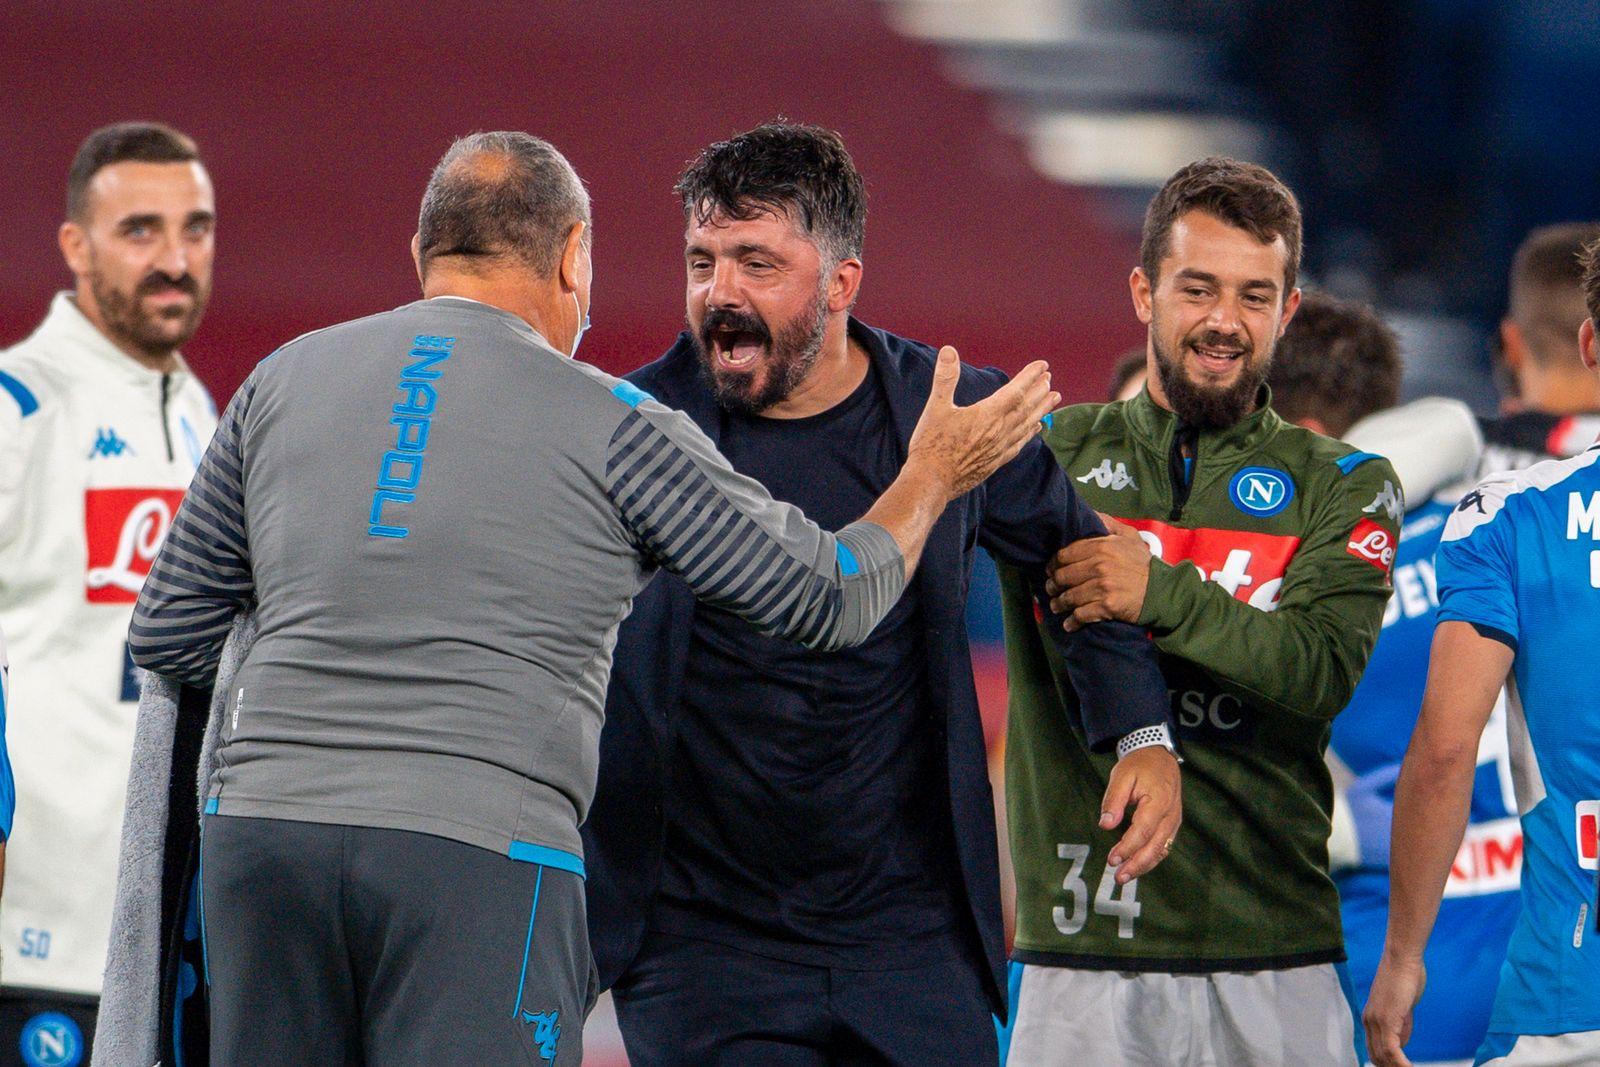 Ivan Gennaro Gattuso Coach (Napoli) Amin Younes (Napoli) during the Italian ÒItaly Cup FinalÓ match between Napoli 4-2 J